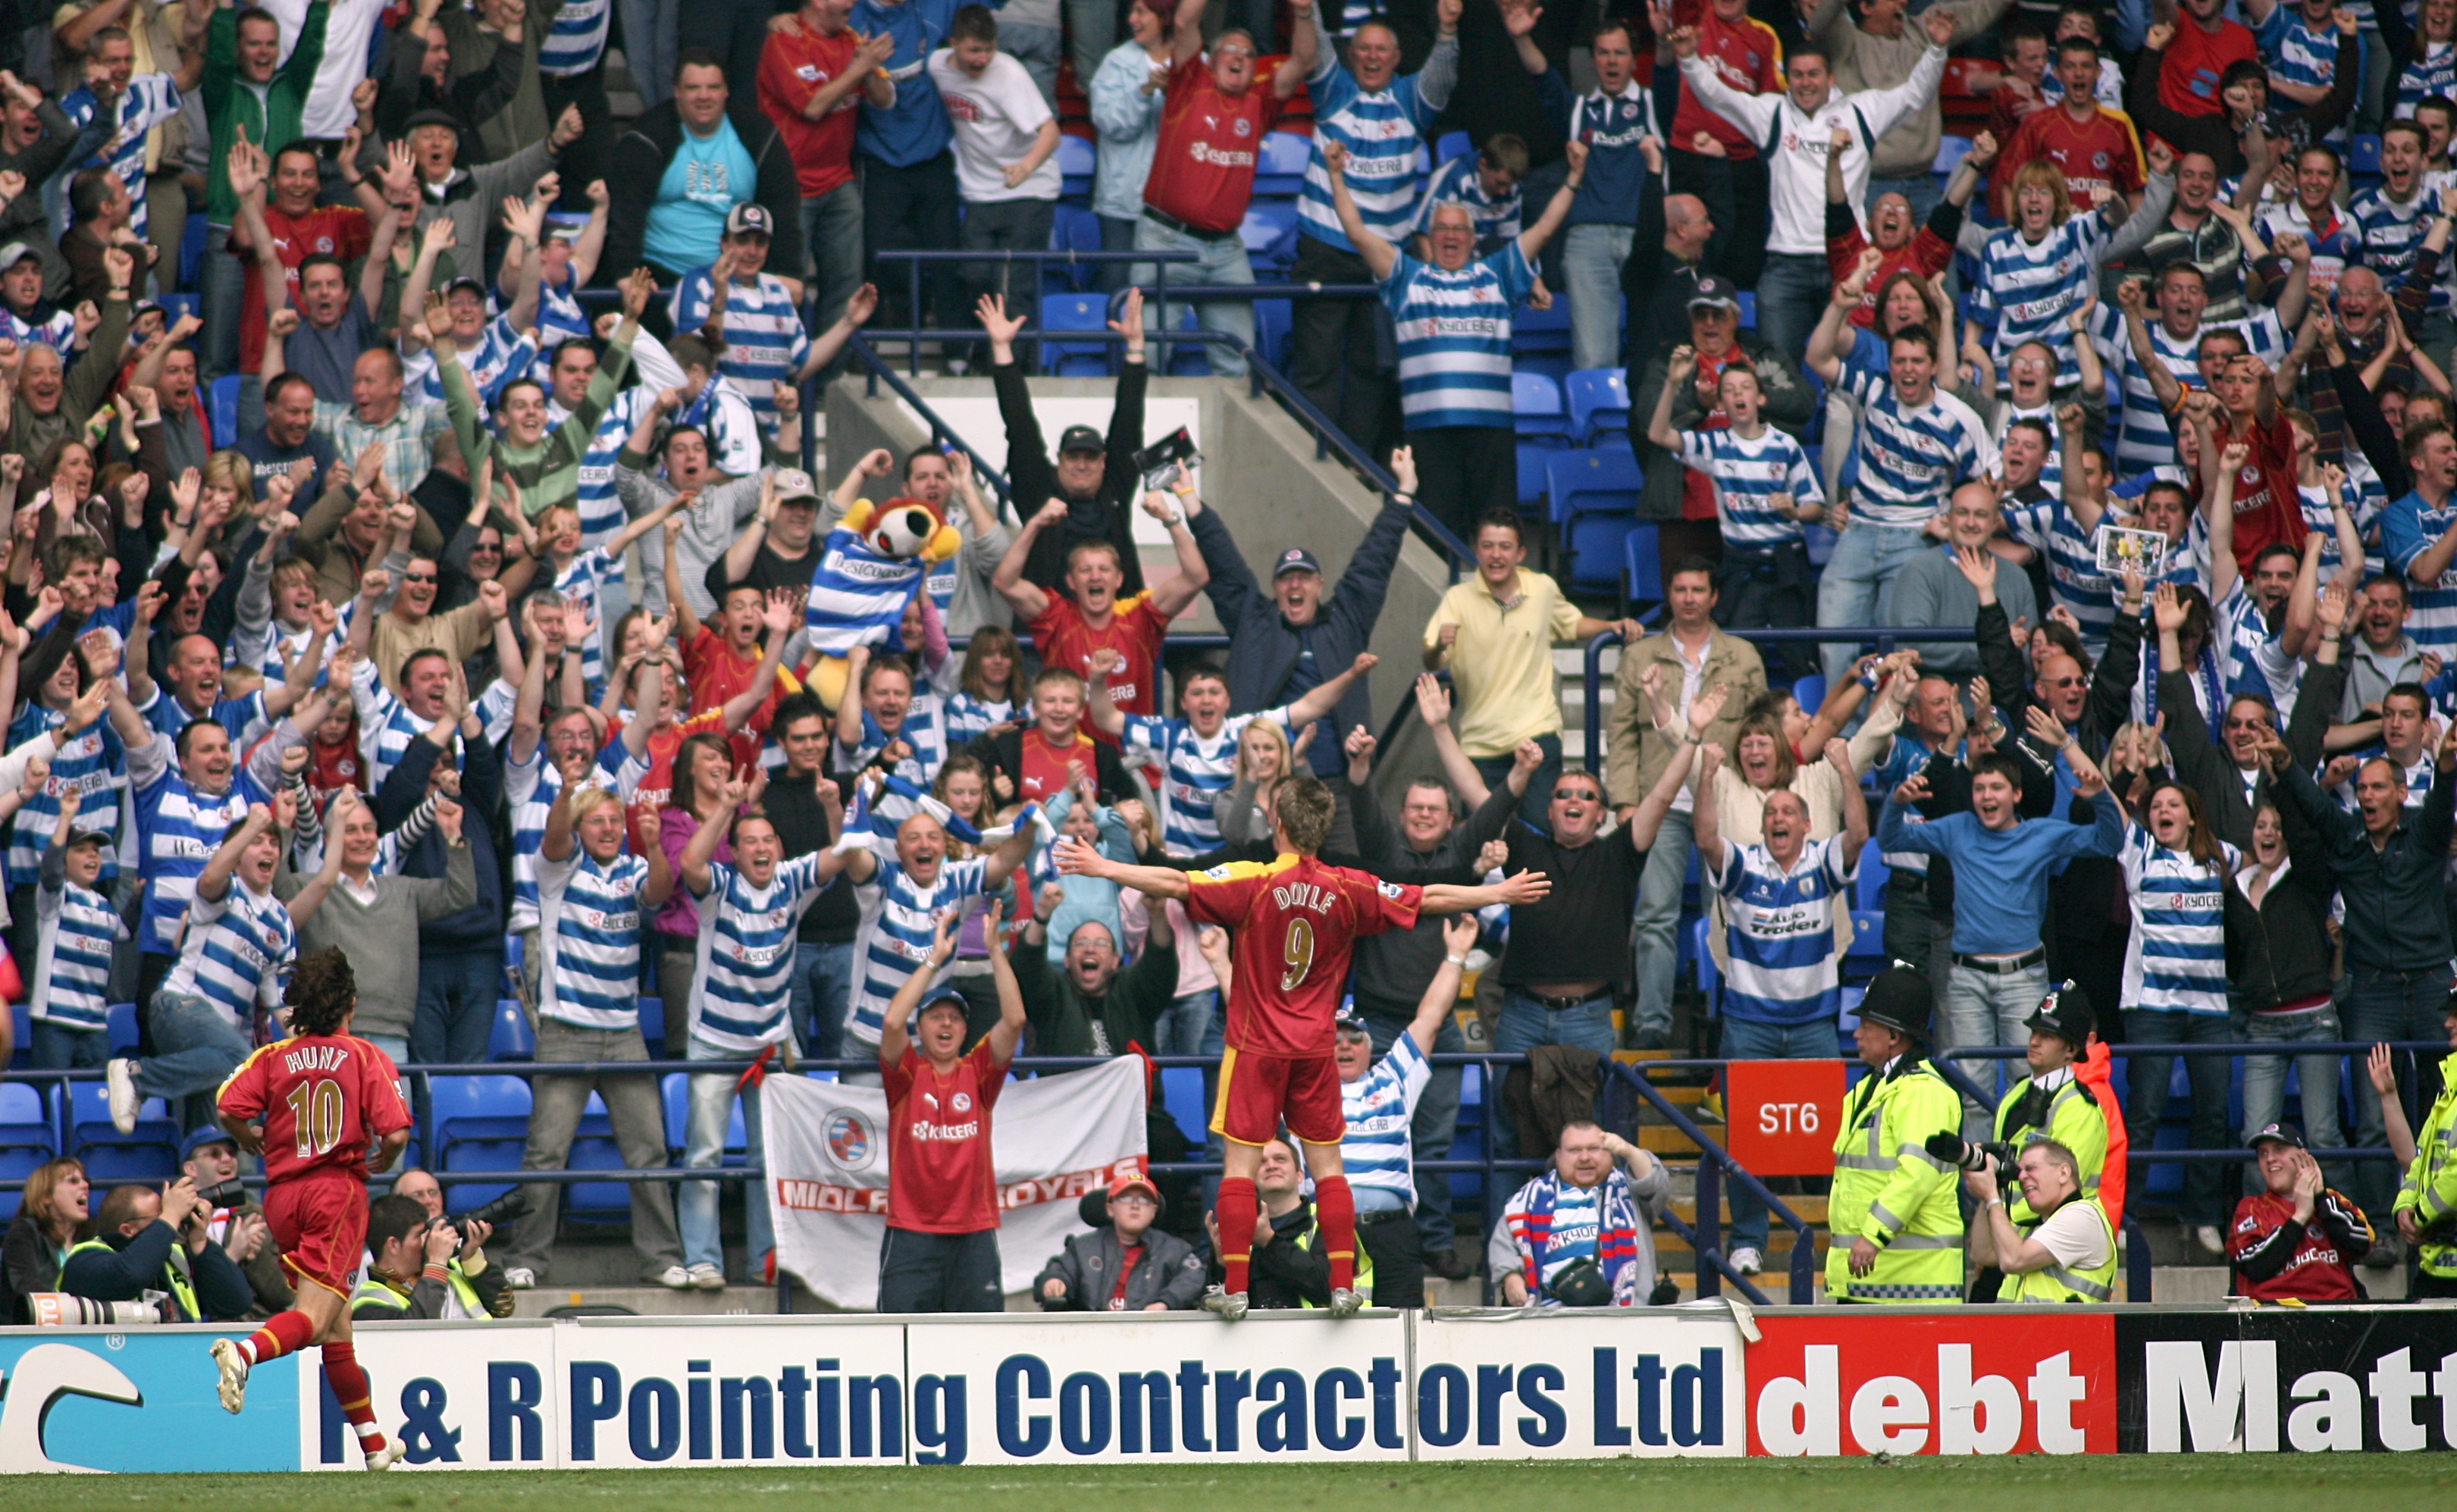 Soccer - FA Barclays Premiership - Bolton Wanderers v Reading - The Reebok Stadium